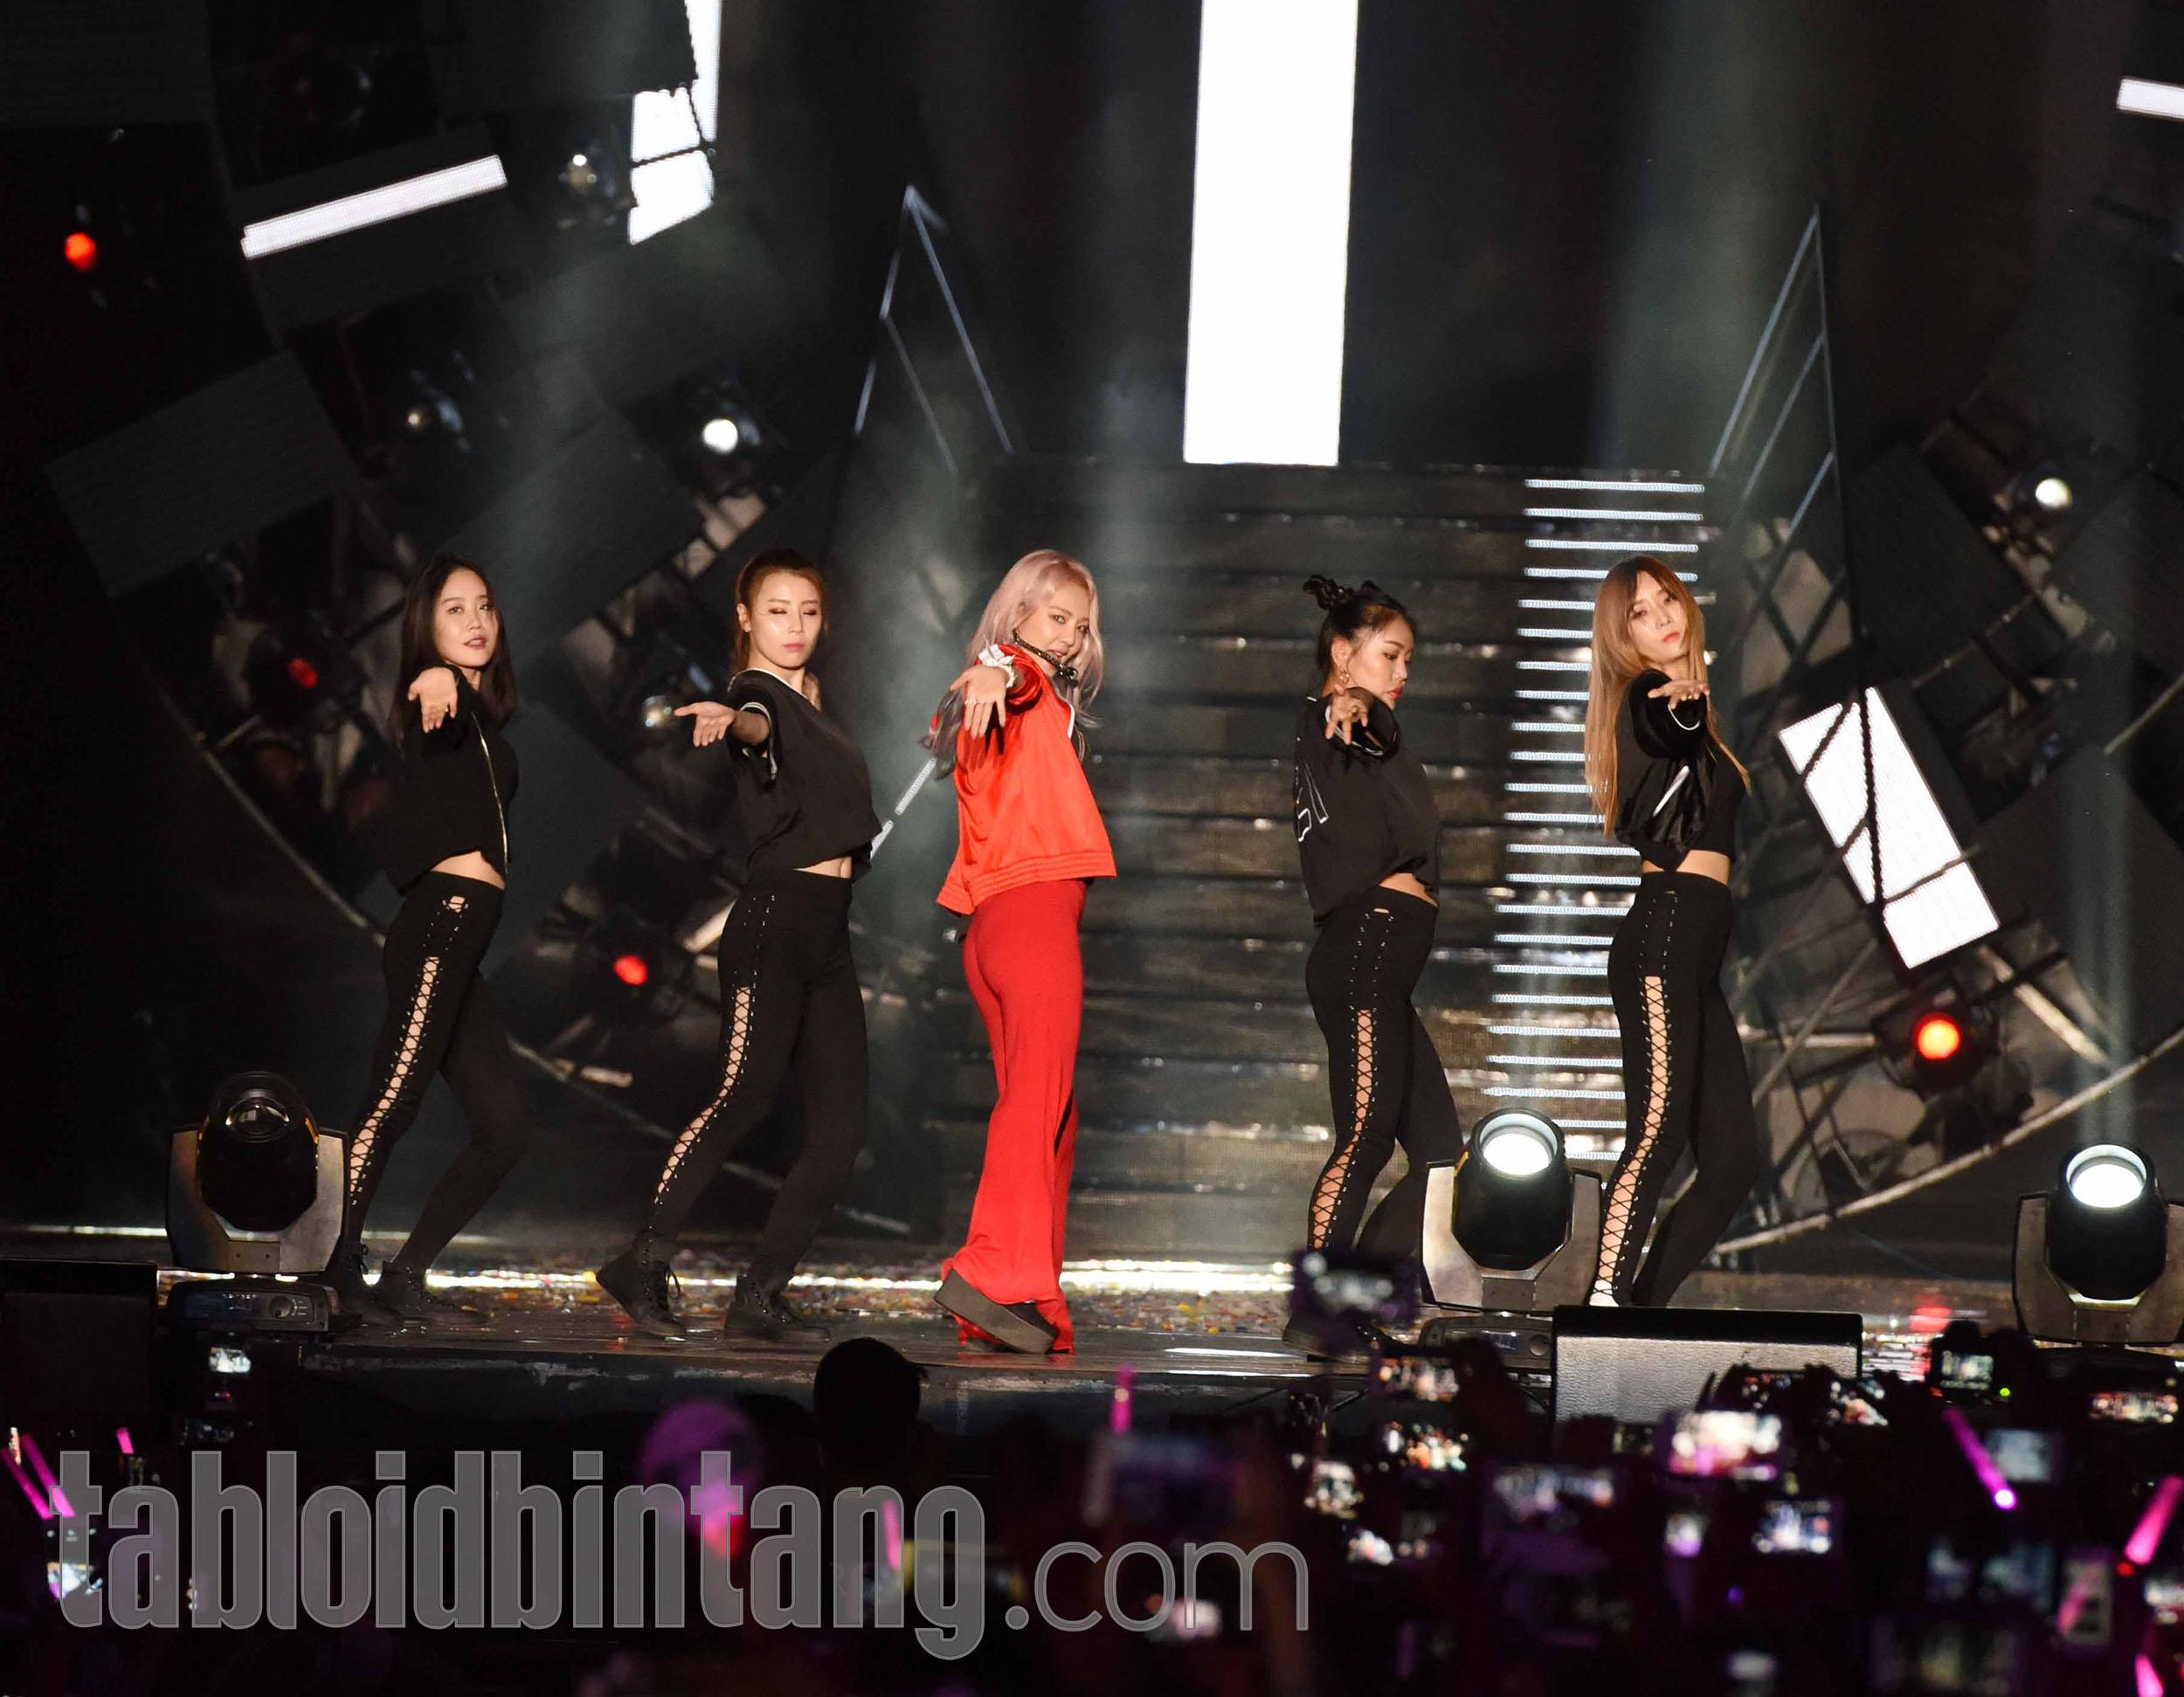 Prediksi Masa Depan SNSD Setelah Tiffany, Seohyun, dan Sooyoung Hengkang